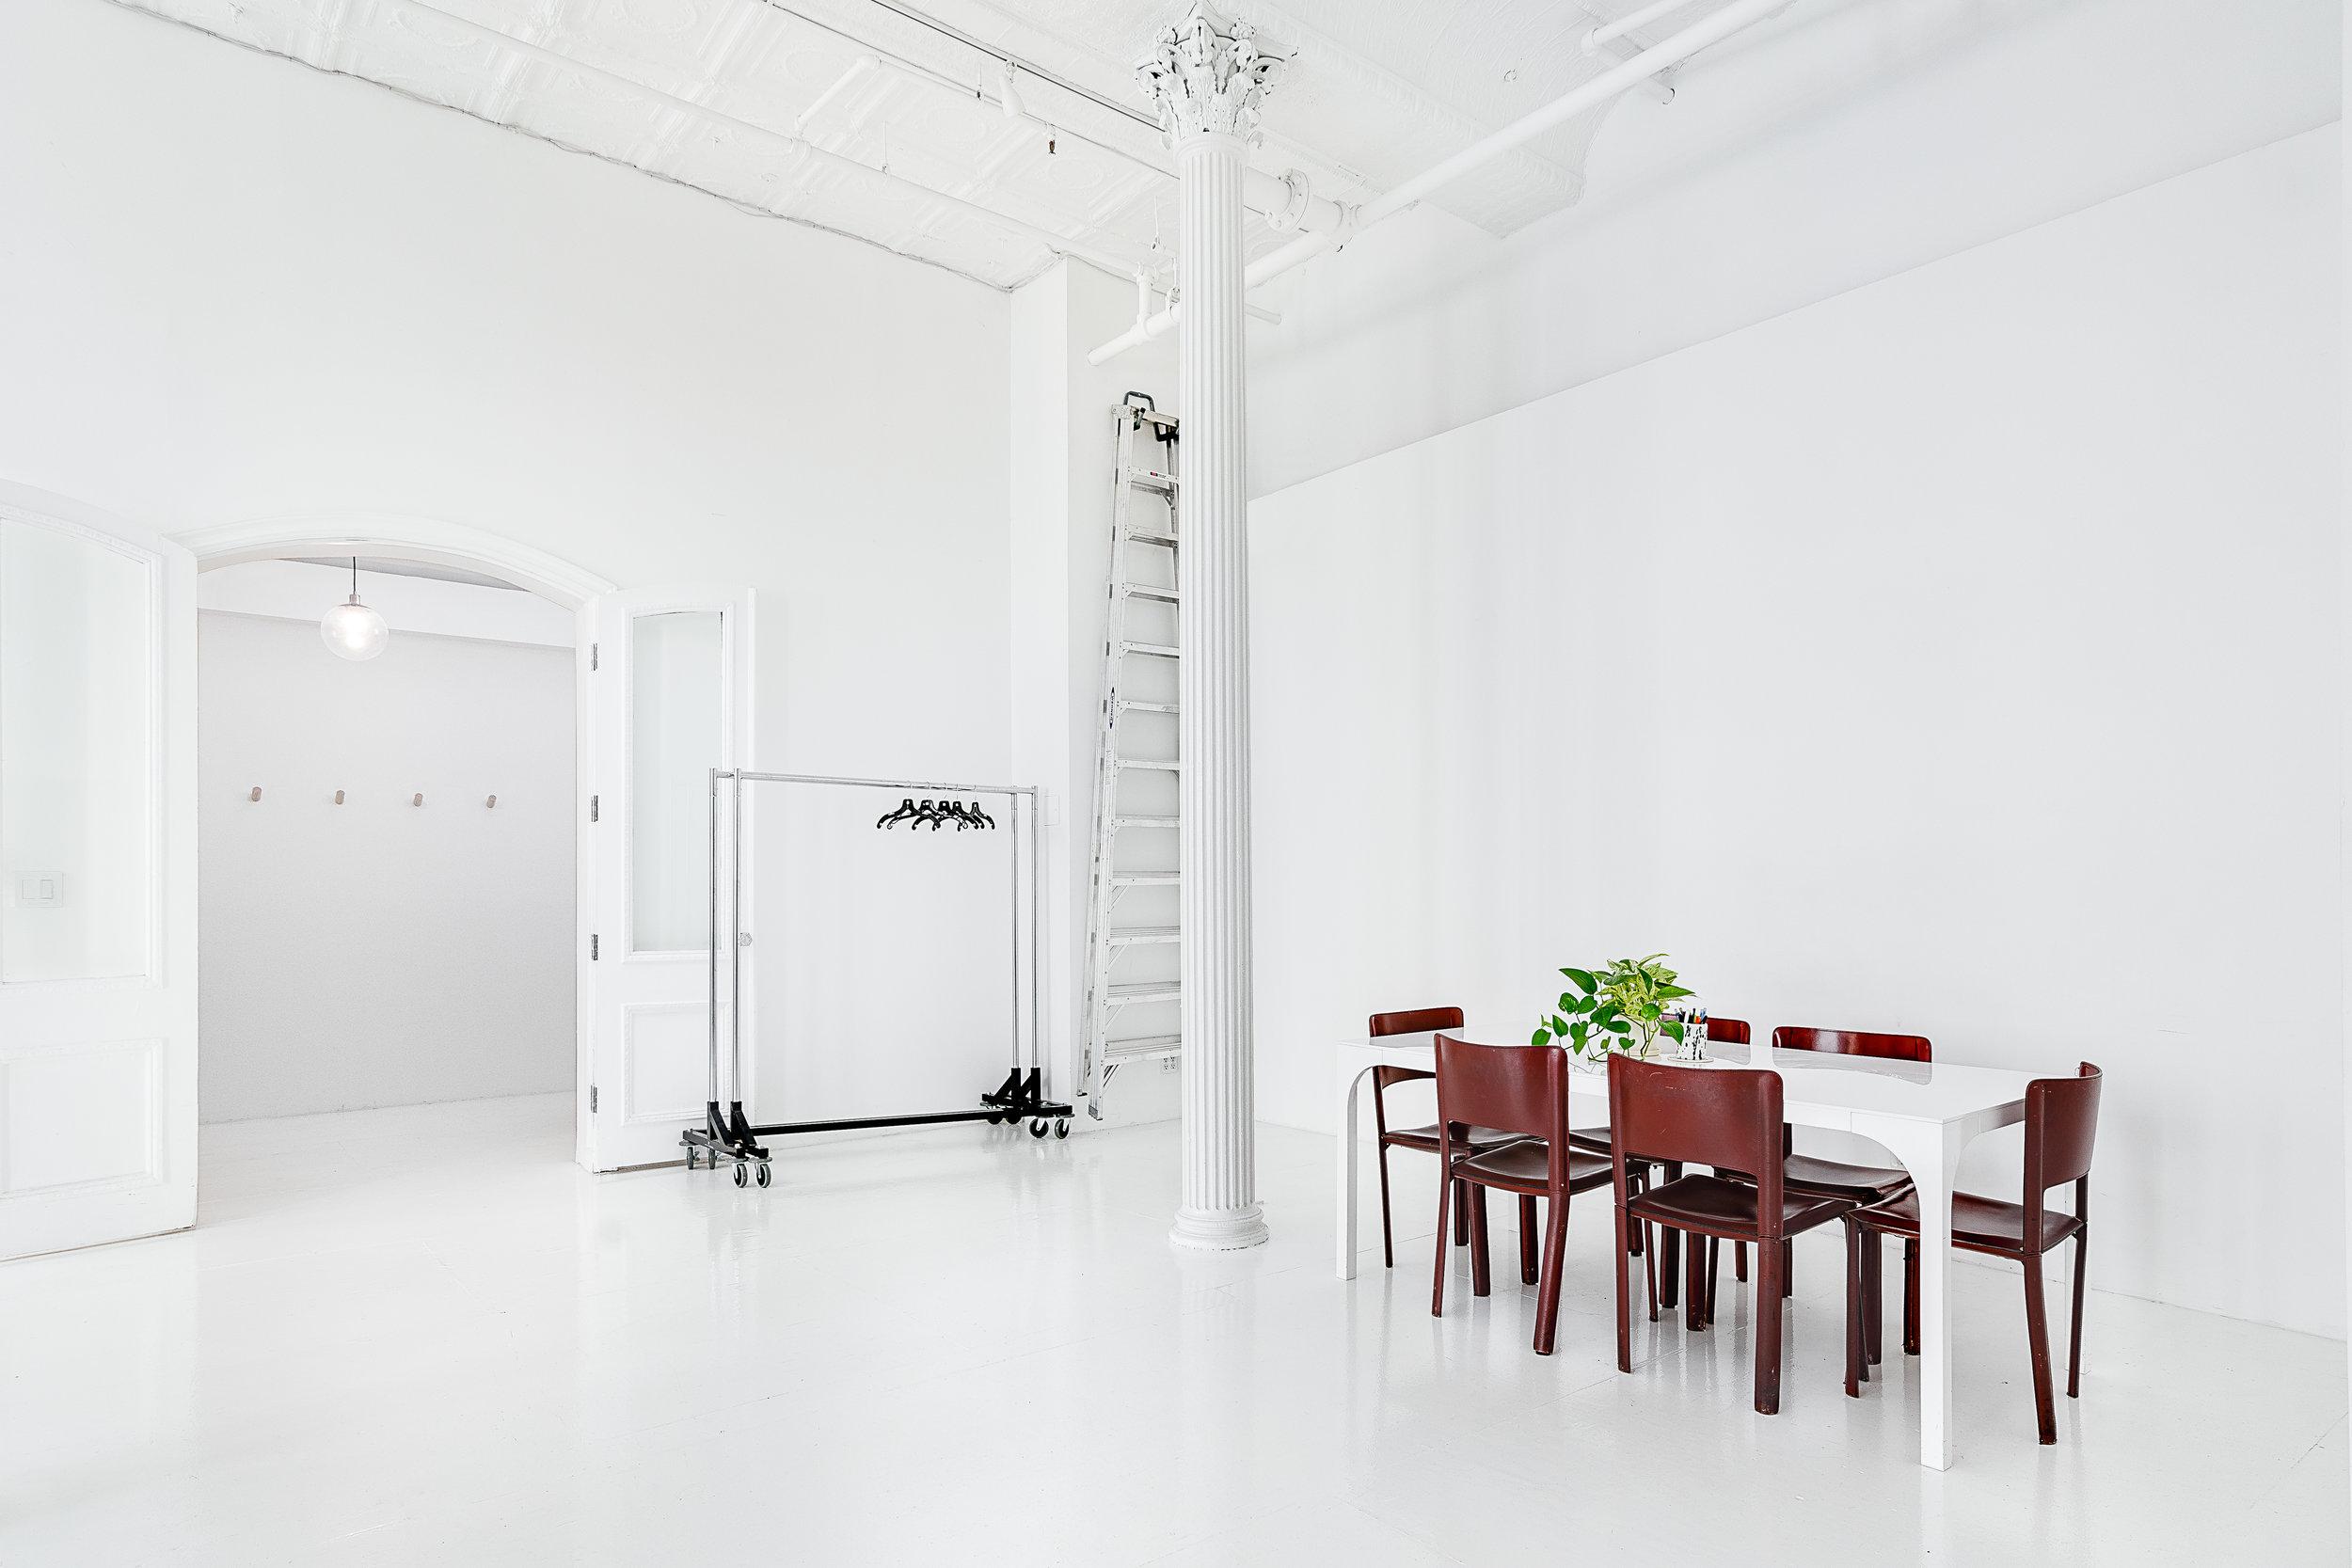 457 Broome Street Unit 2F - Blank Studio - Reshoot-4.jpg